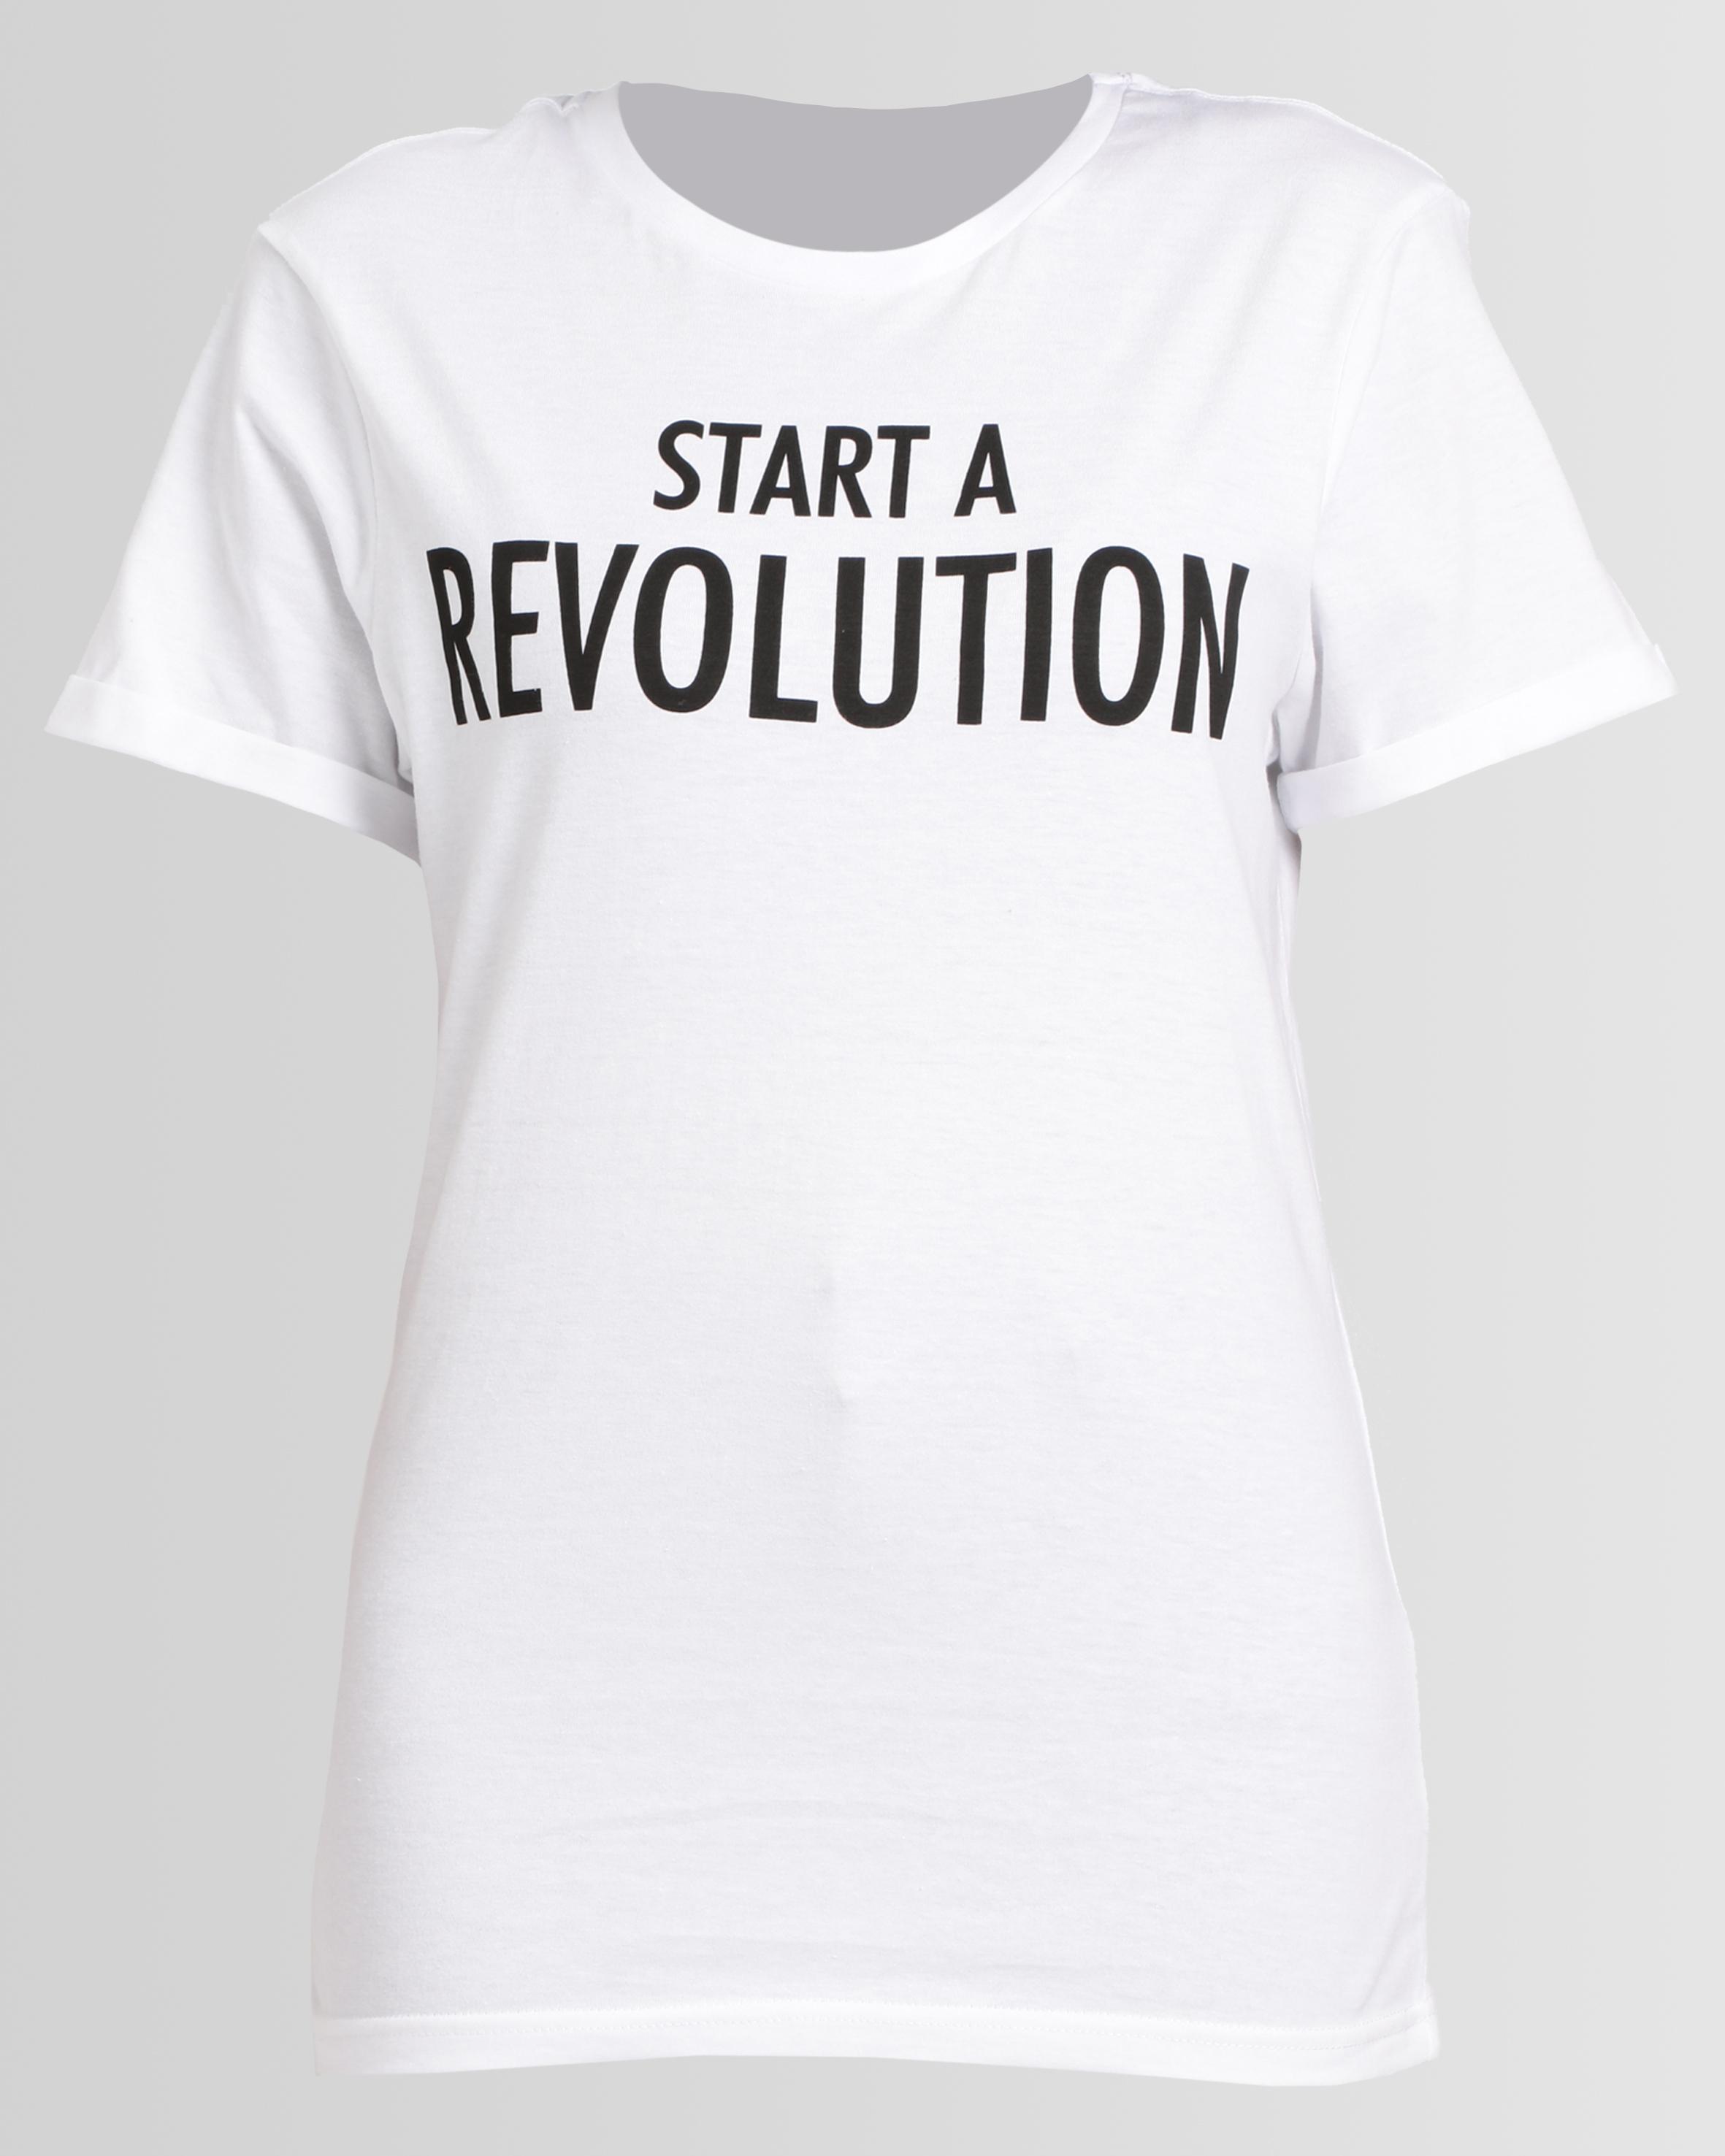 Slogan T-shirt from Zando